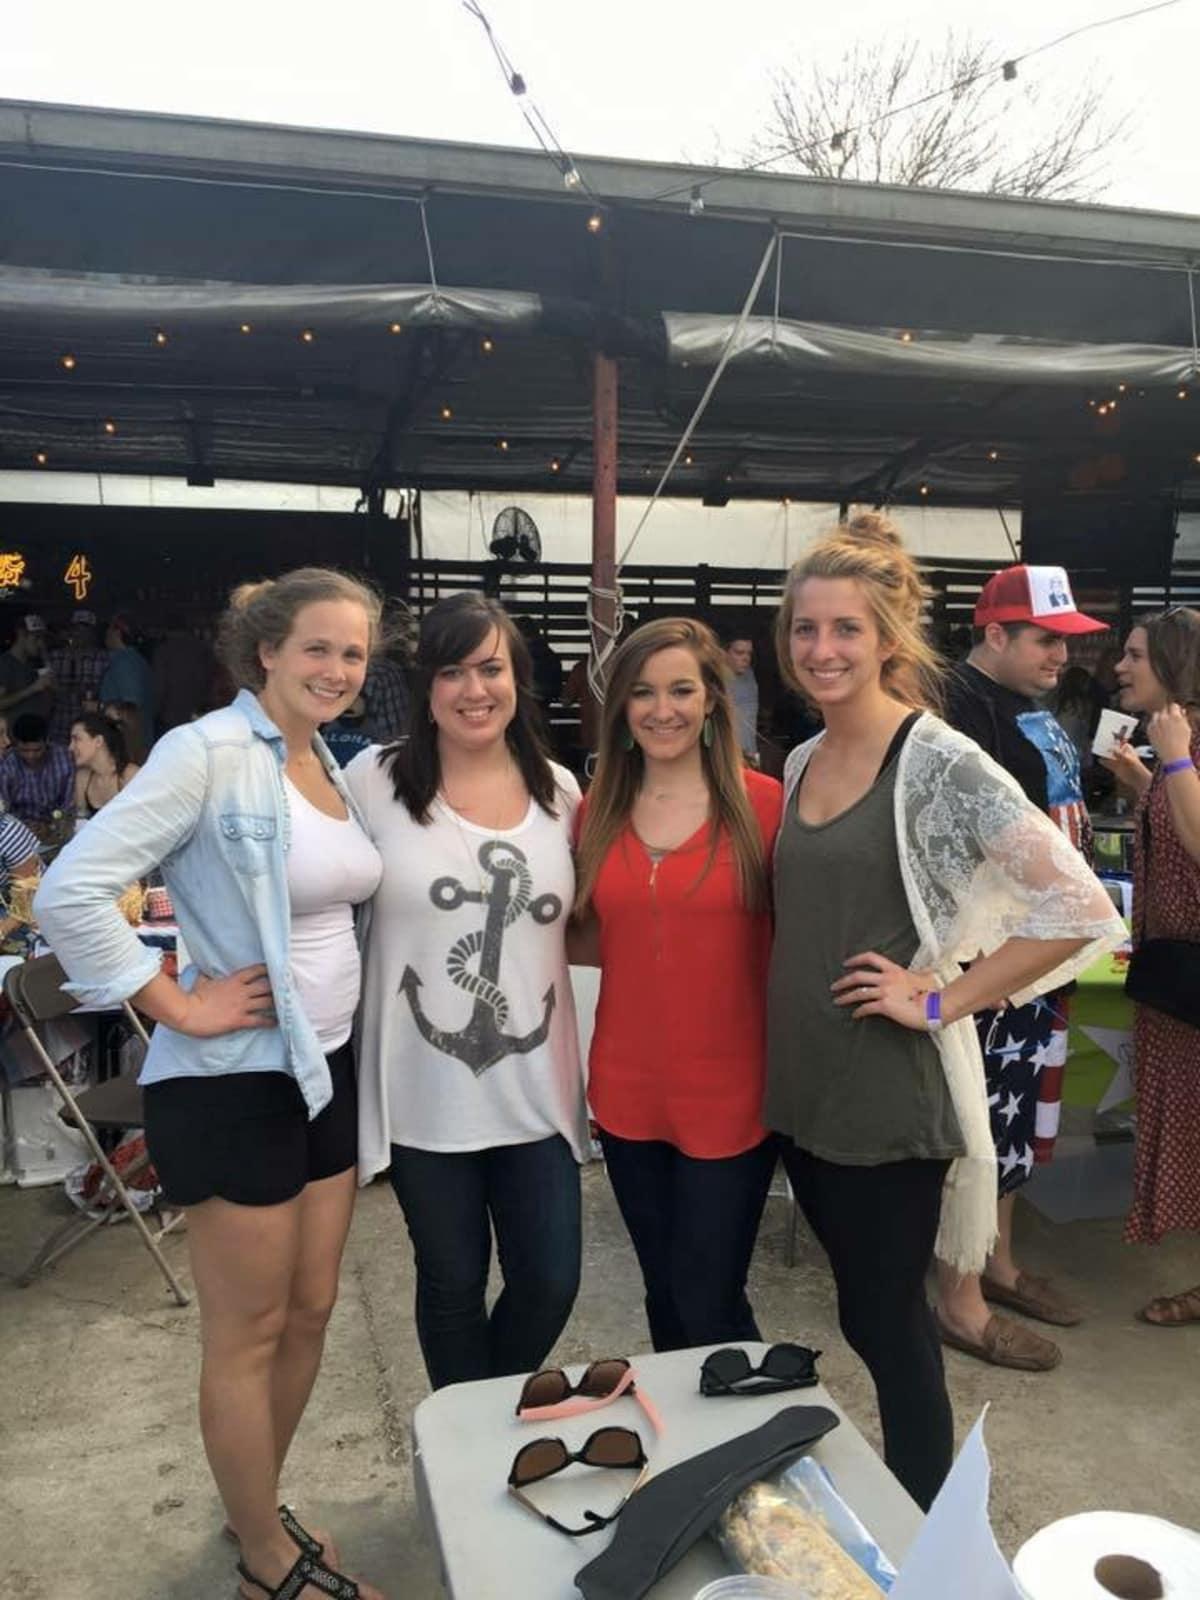 Casa de Esperanza chili cook-off, March 2016, Heather Darr, Sarah Owens, Ally Hatz, Becca Elise